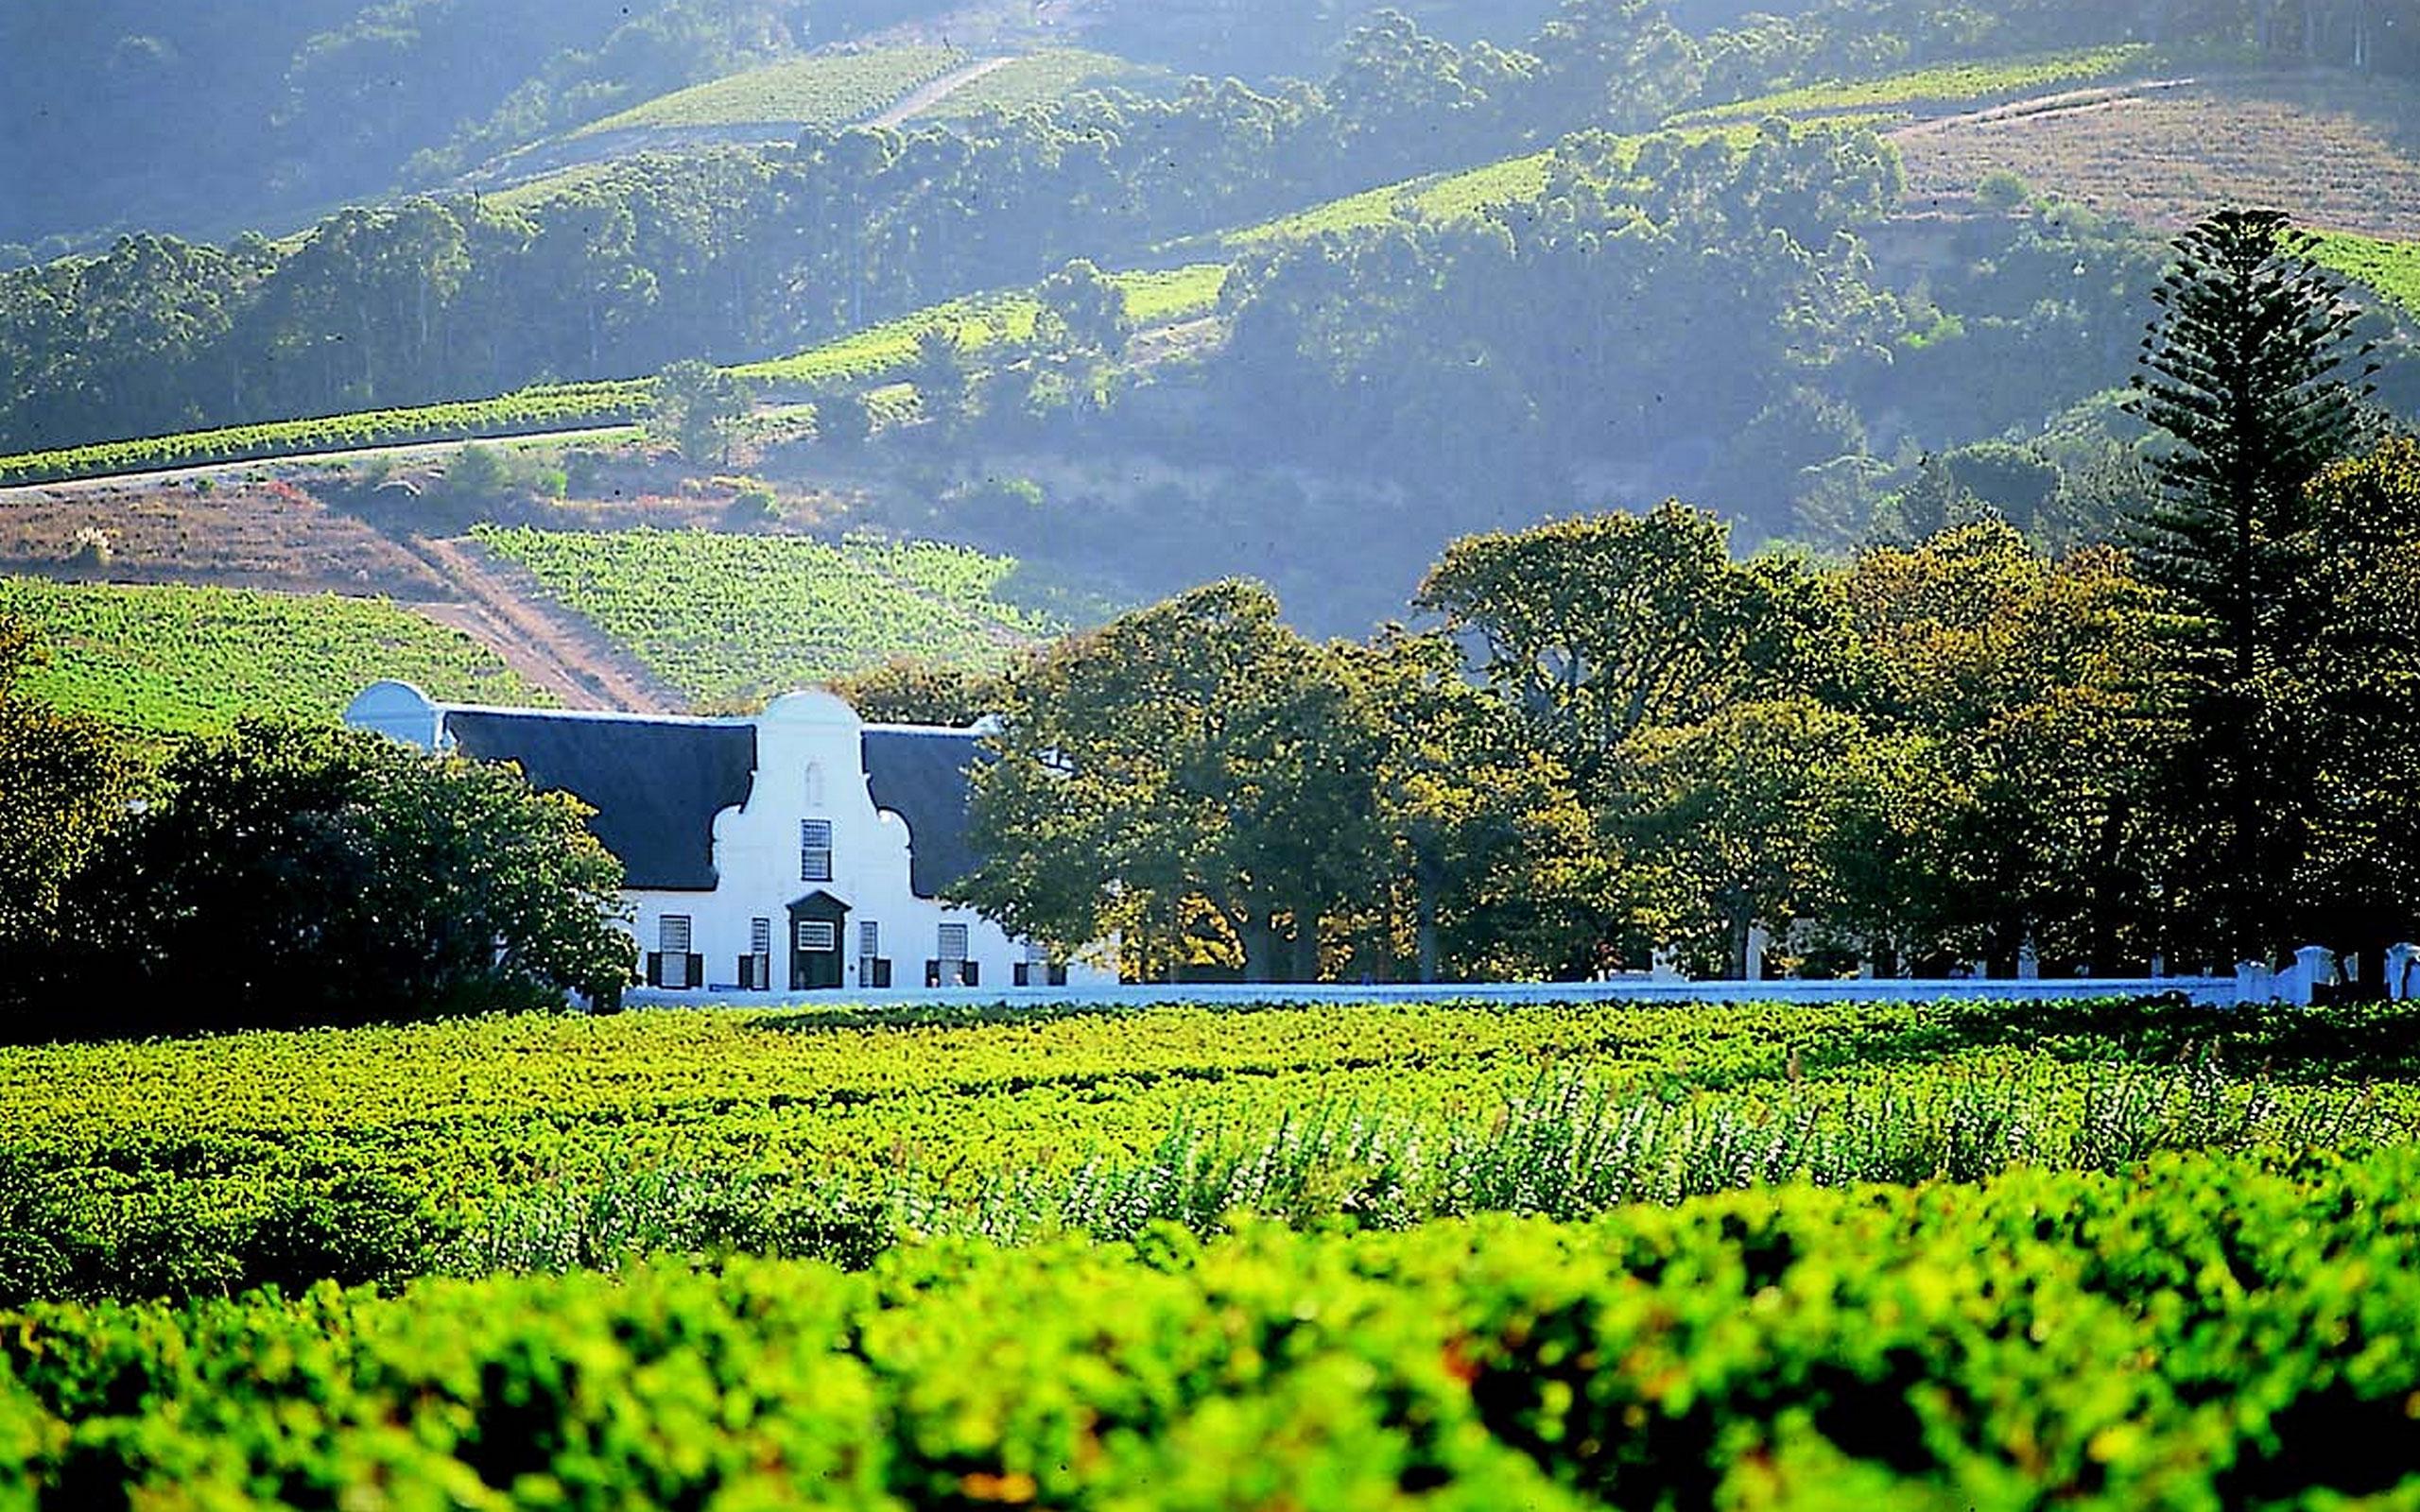 Hawksmoor house stellenbosch sudafrica enkosi africa region de los vinos del cabo